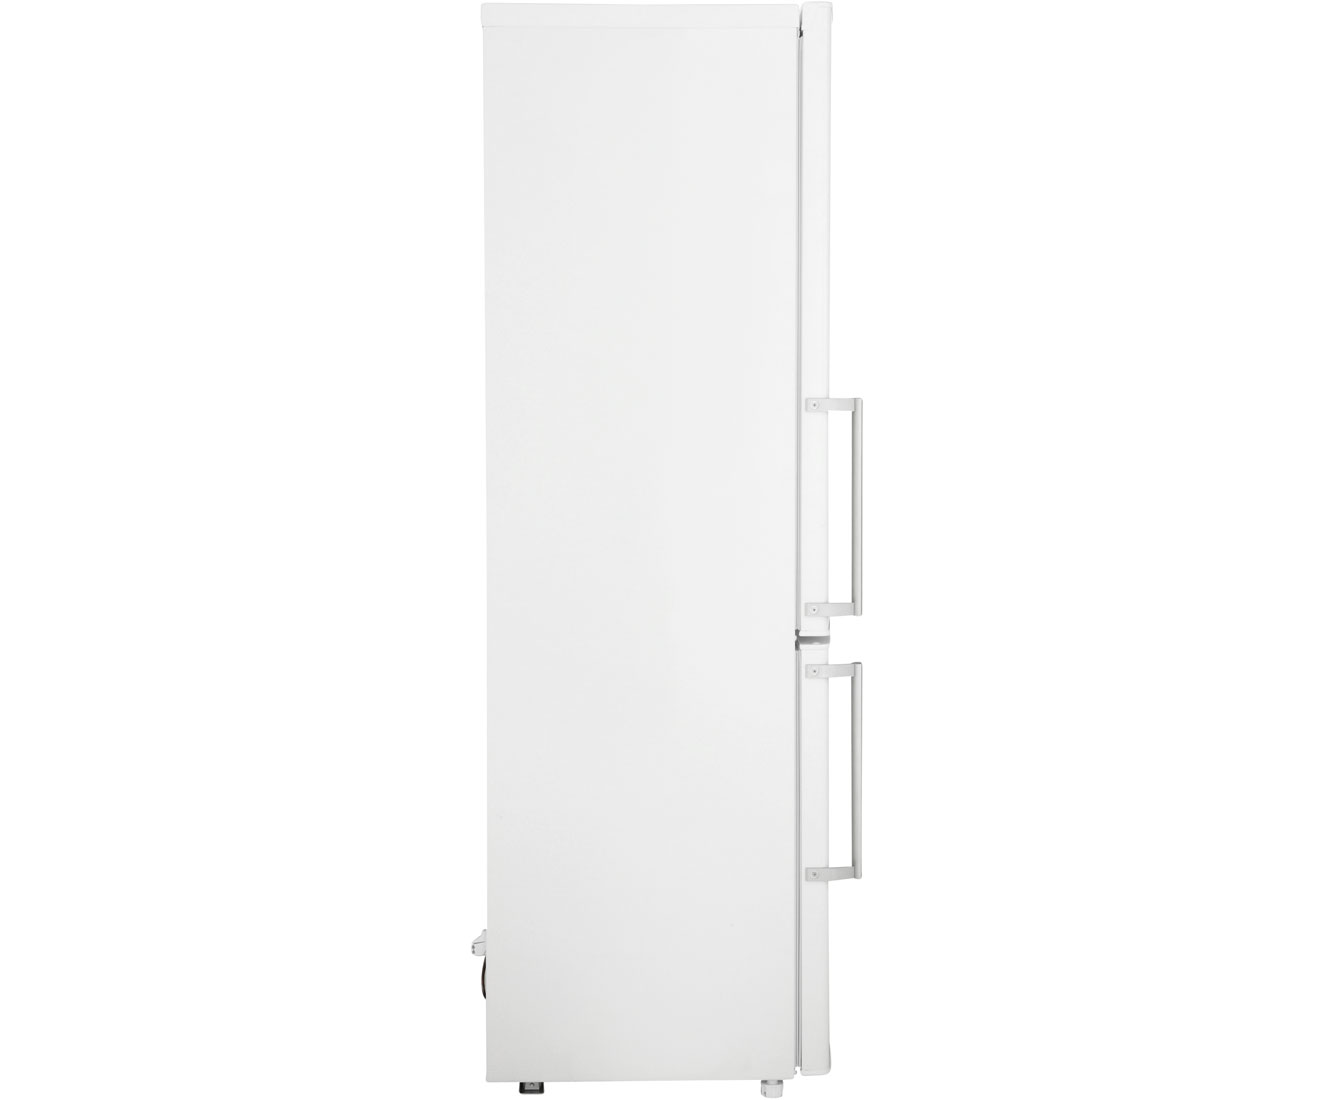 Amica Kühlschrank Türanschlag Wechseln : Amica kgc e kühl gefrierkombination edelstahl optik a